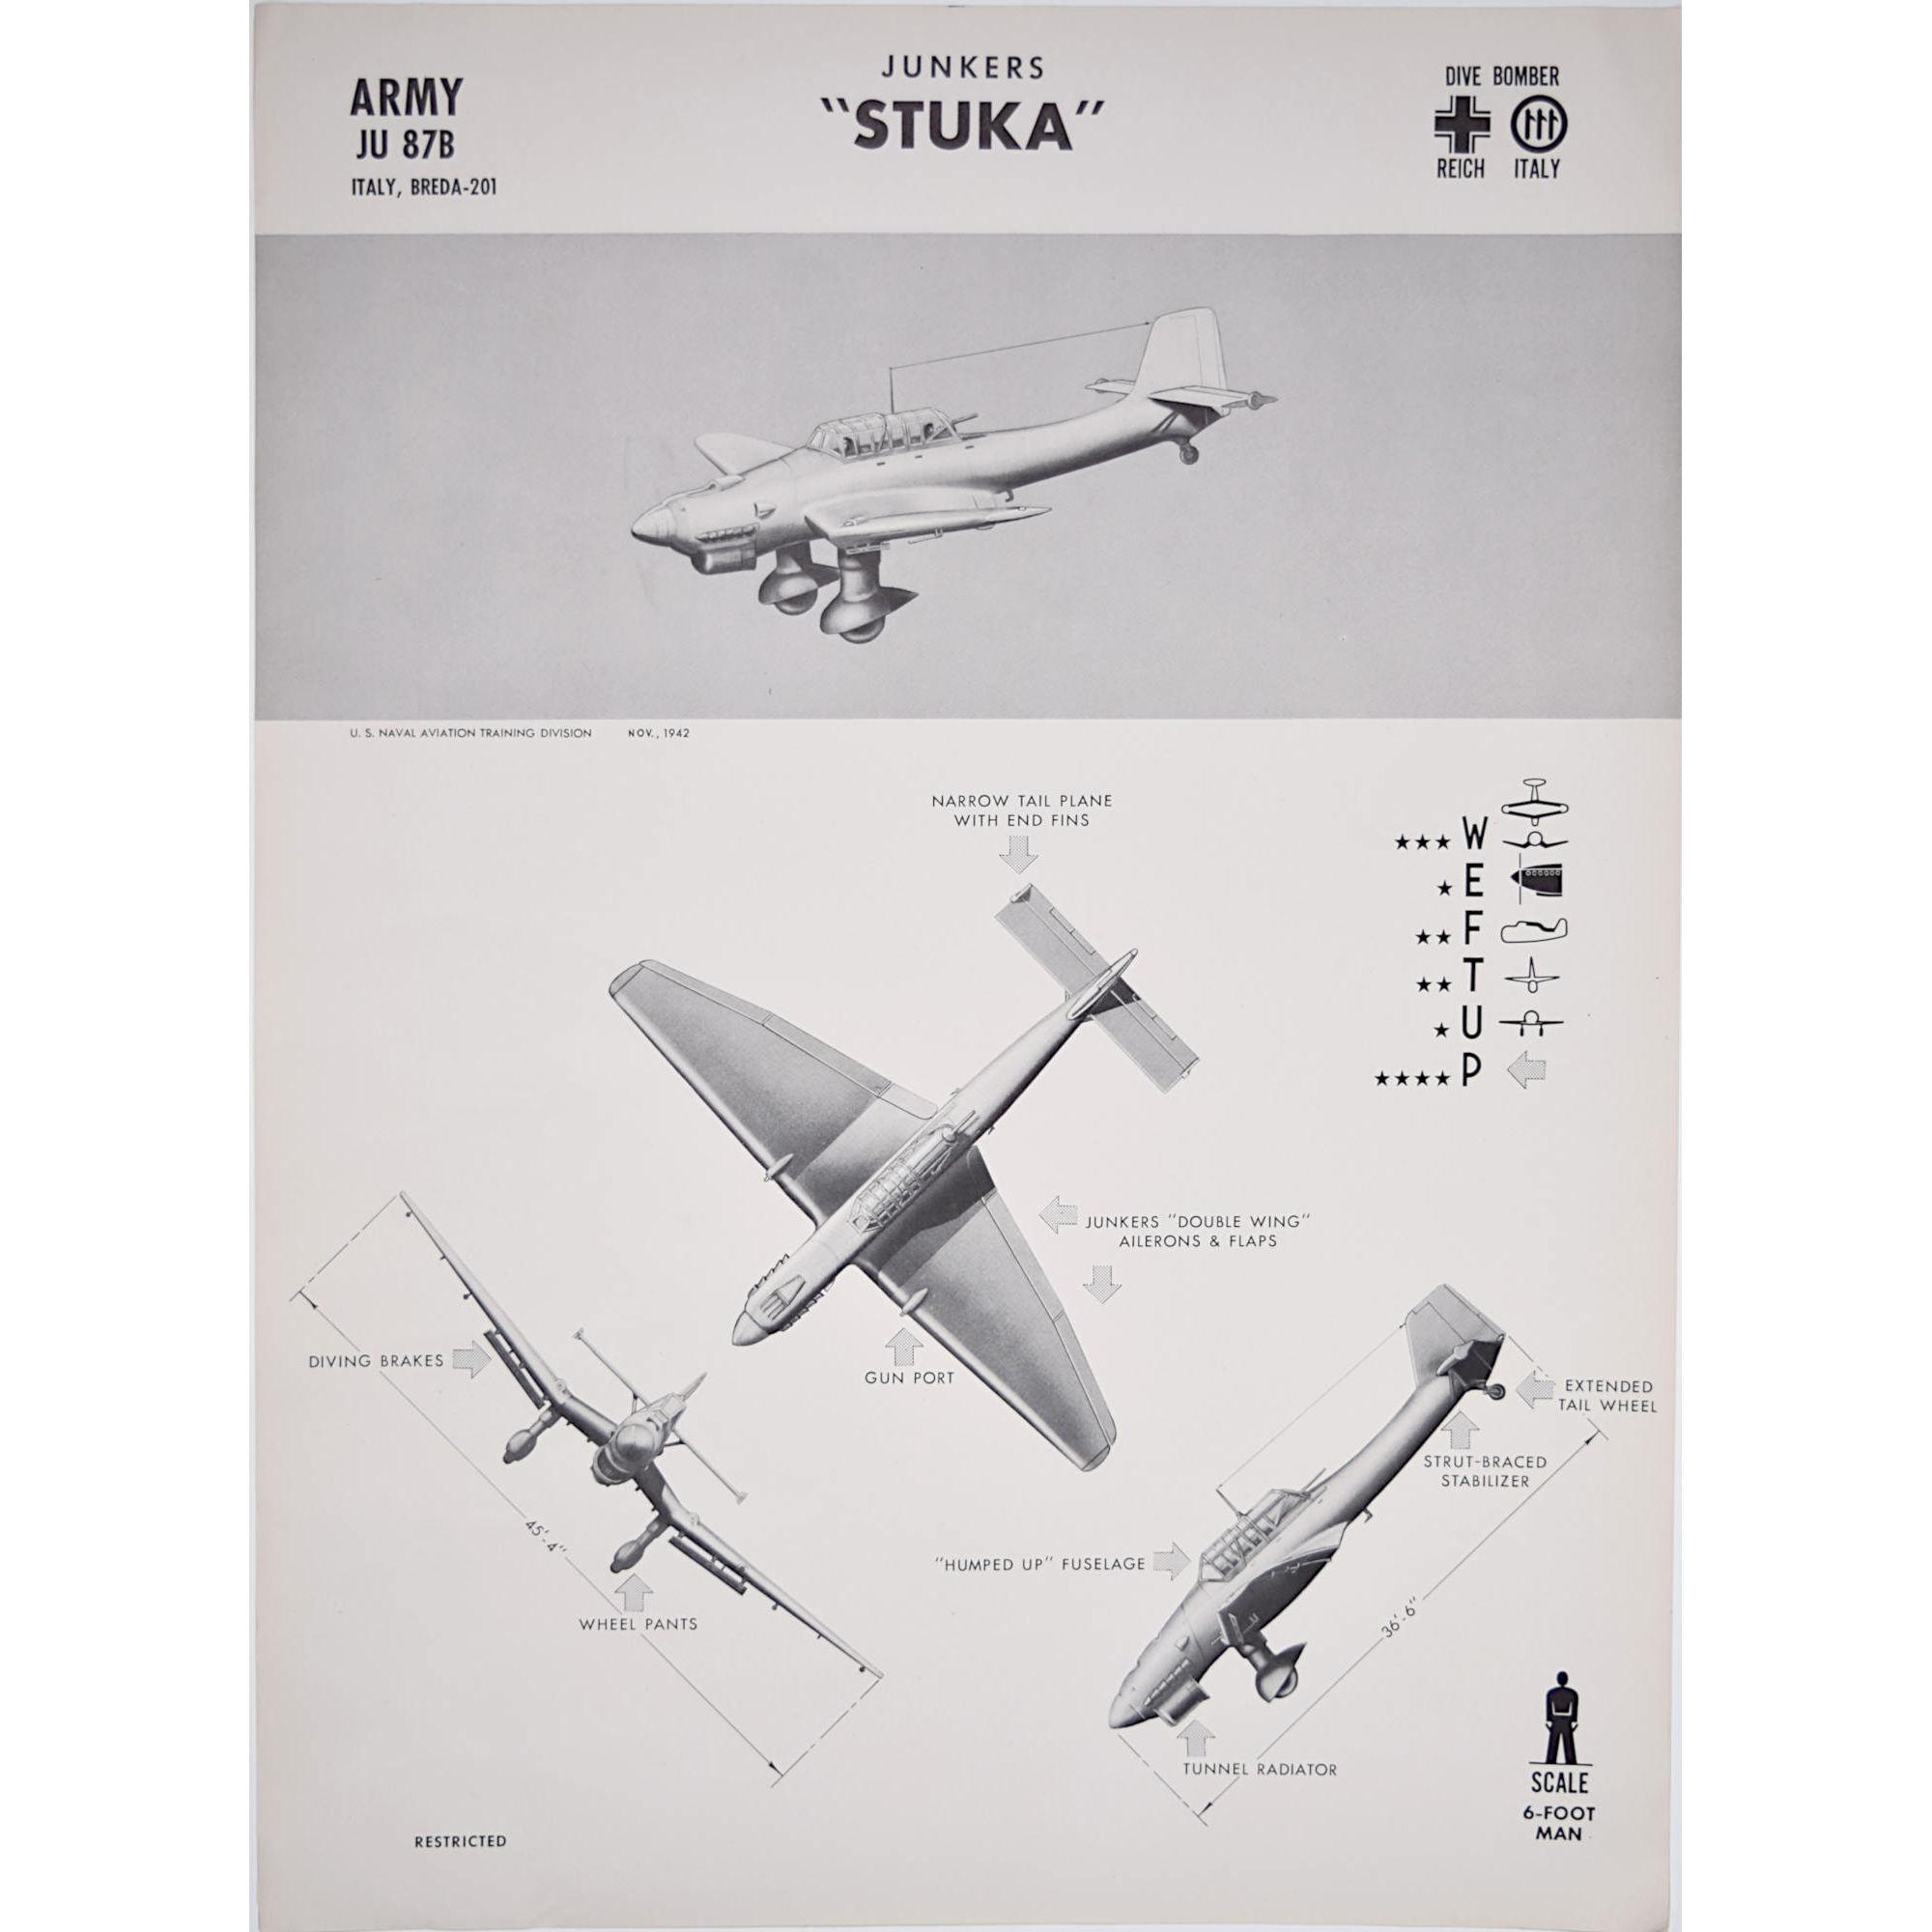 Junkers Stuka Dive Bomber WW2 original aircraft recognition poster